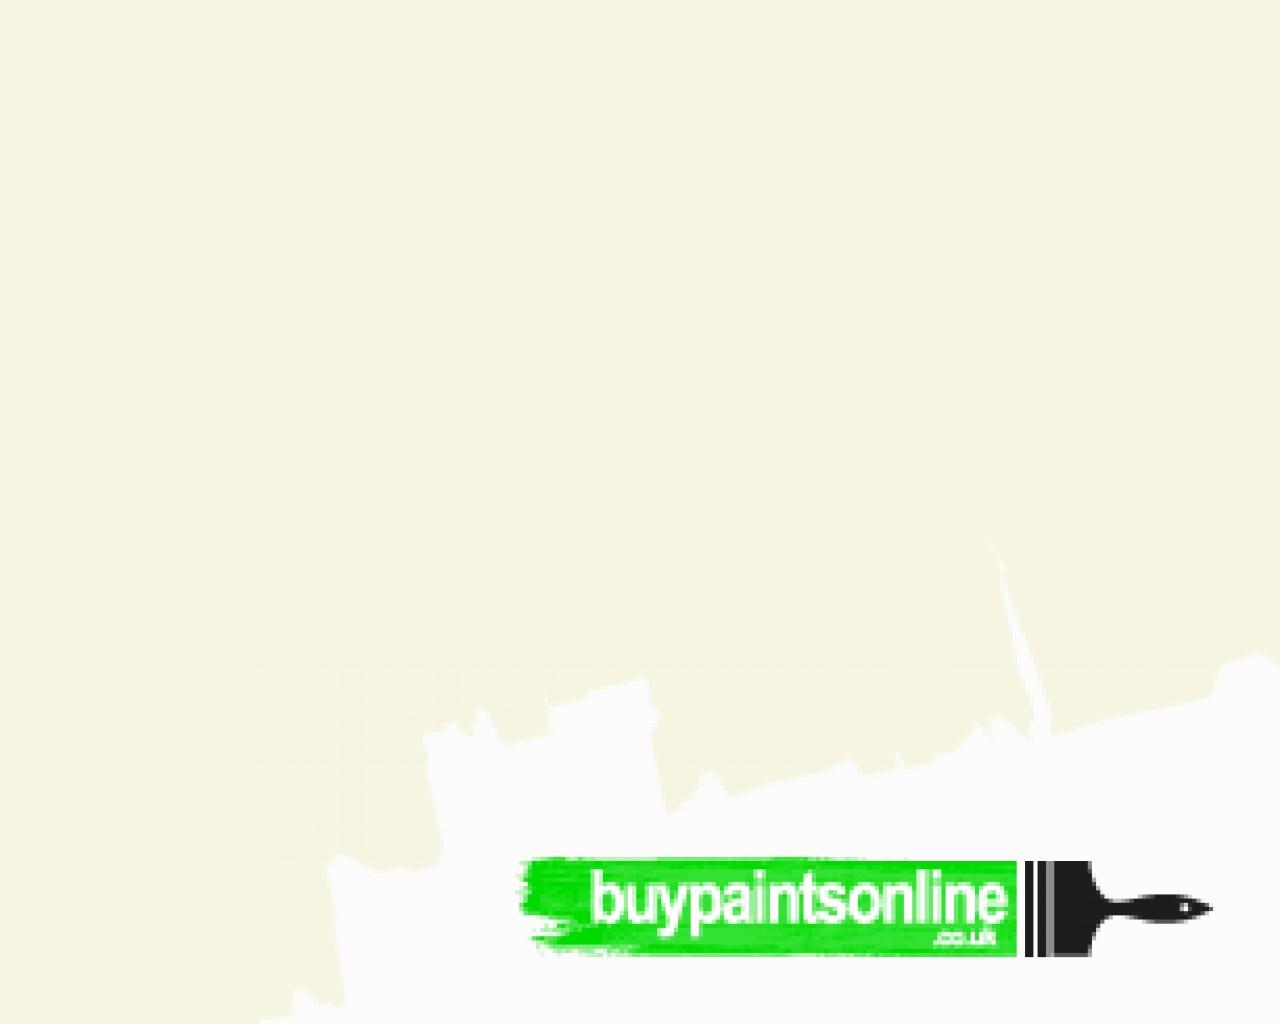 Ral Reinweiß ral 9010 crown trade paints ral colours buy paints